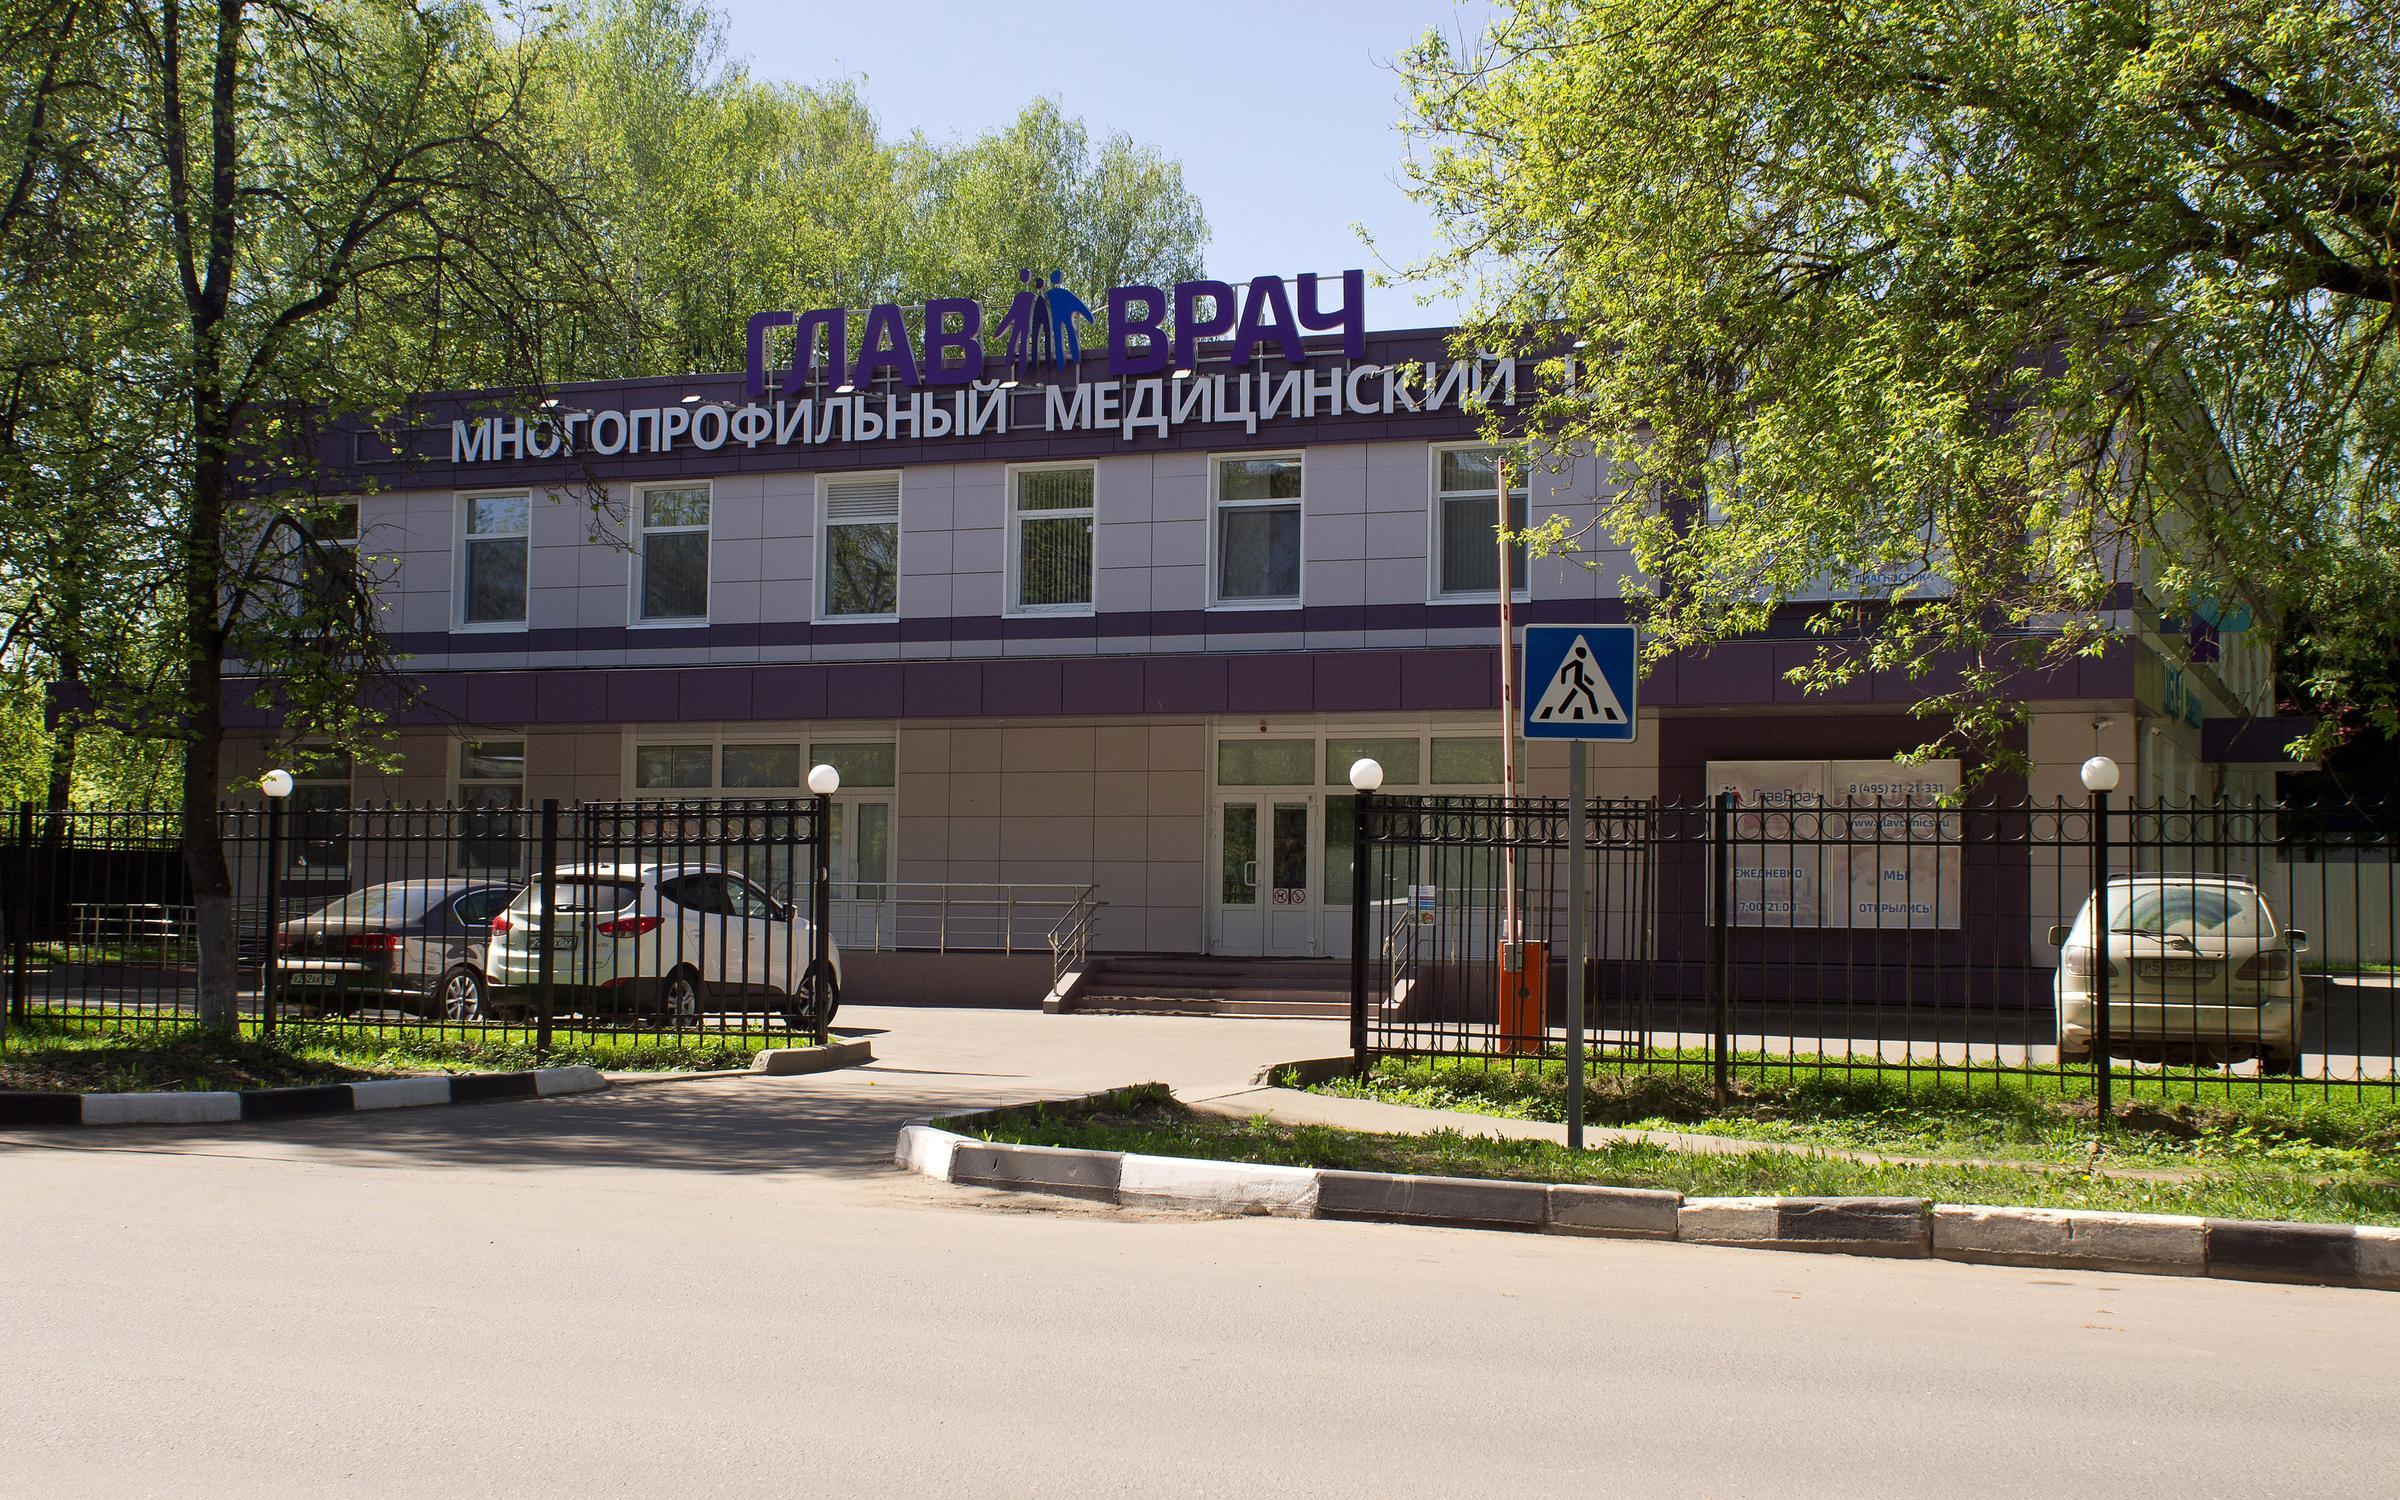 фотография Медицинского центра ГлавВрач на улице Ленина в Наро-Фоминске